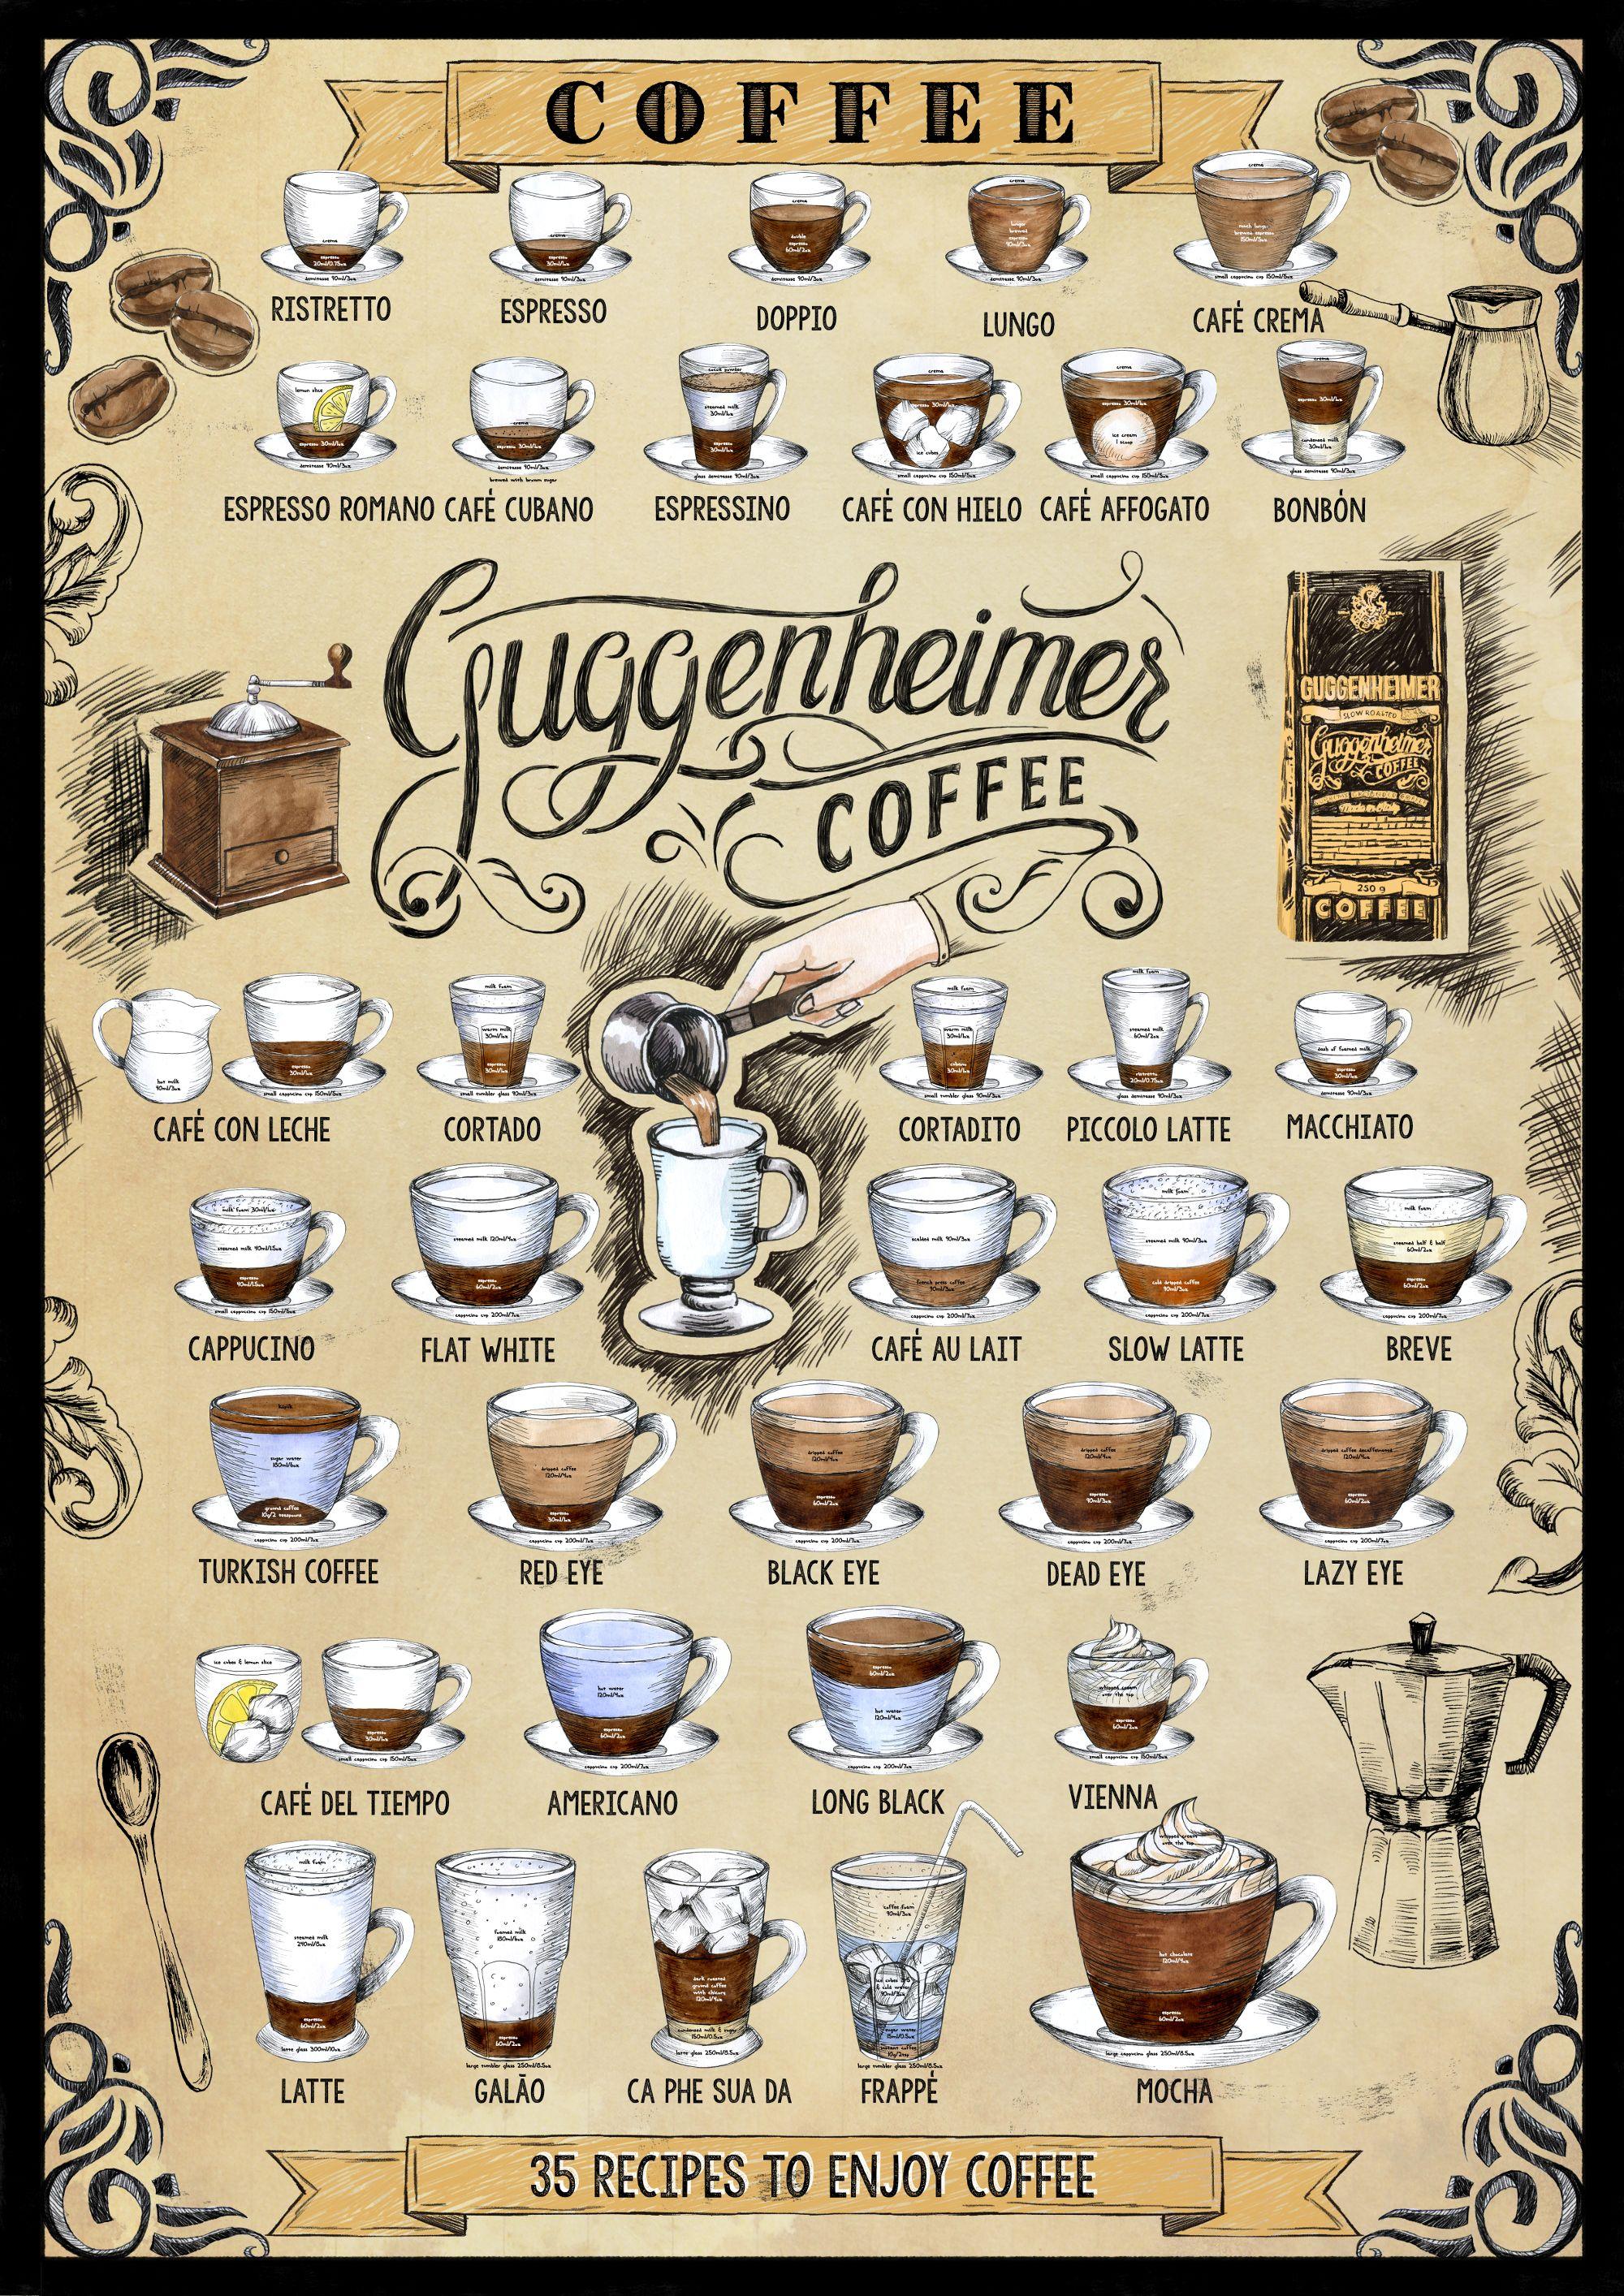 35 kaffee rezepte poster 50 x 70cm guggenheimer coffee supreme slow roasted coffee. Black Bedroom Furniture Sets. Home Design Ideas